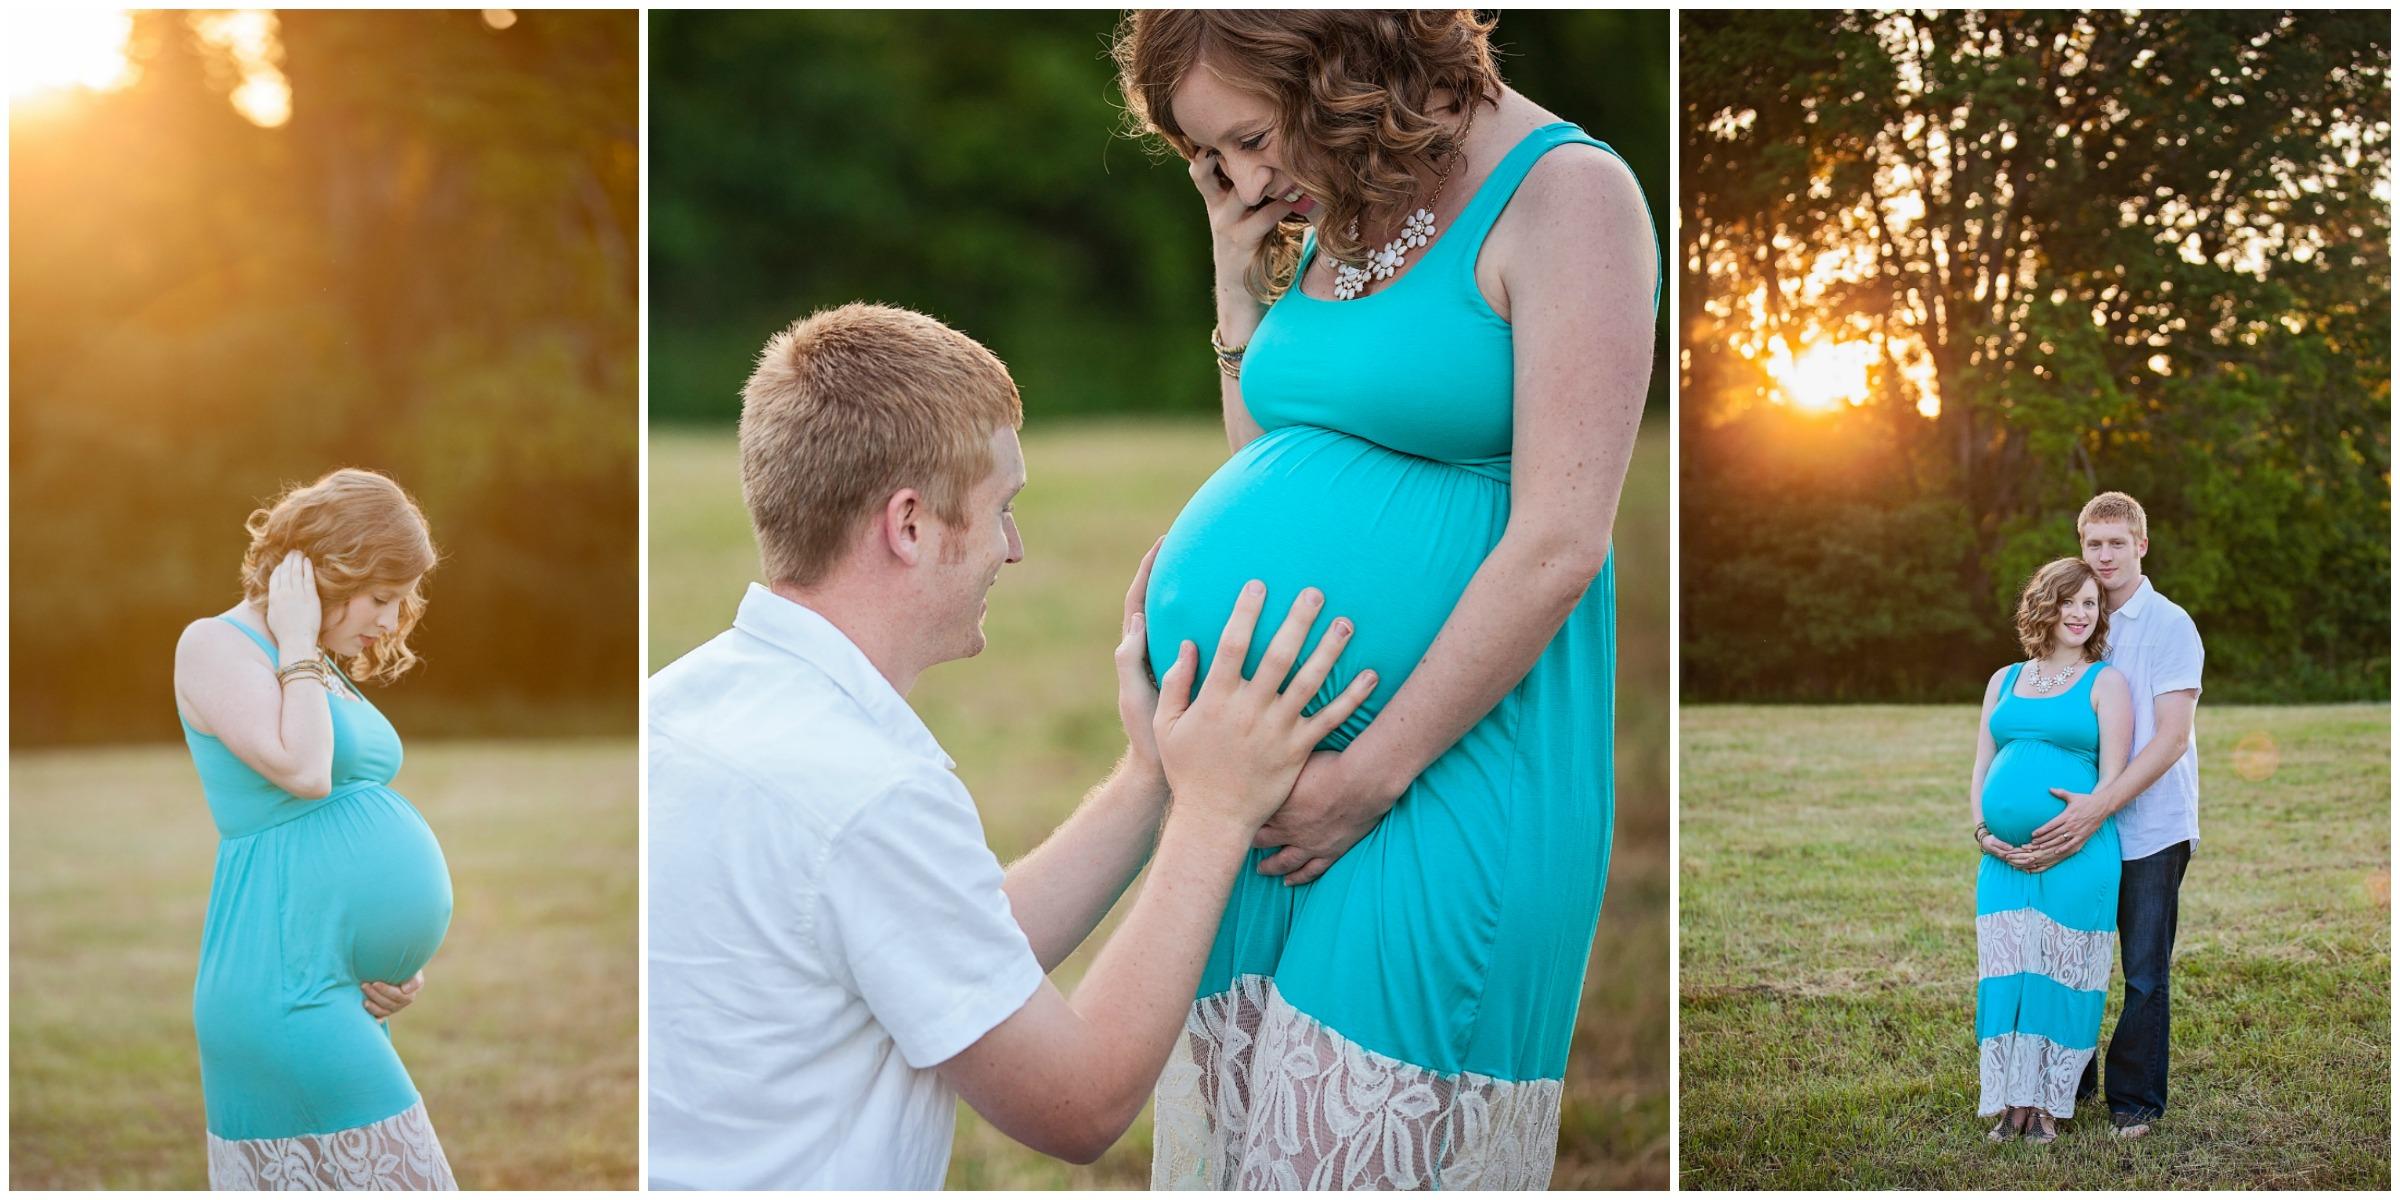 MaternityFINAL